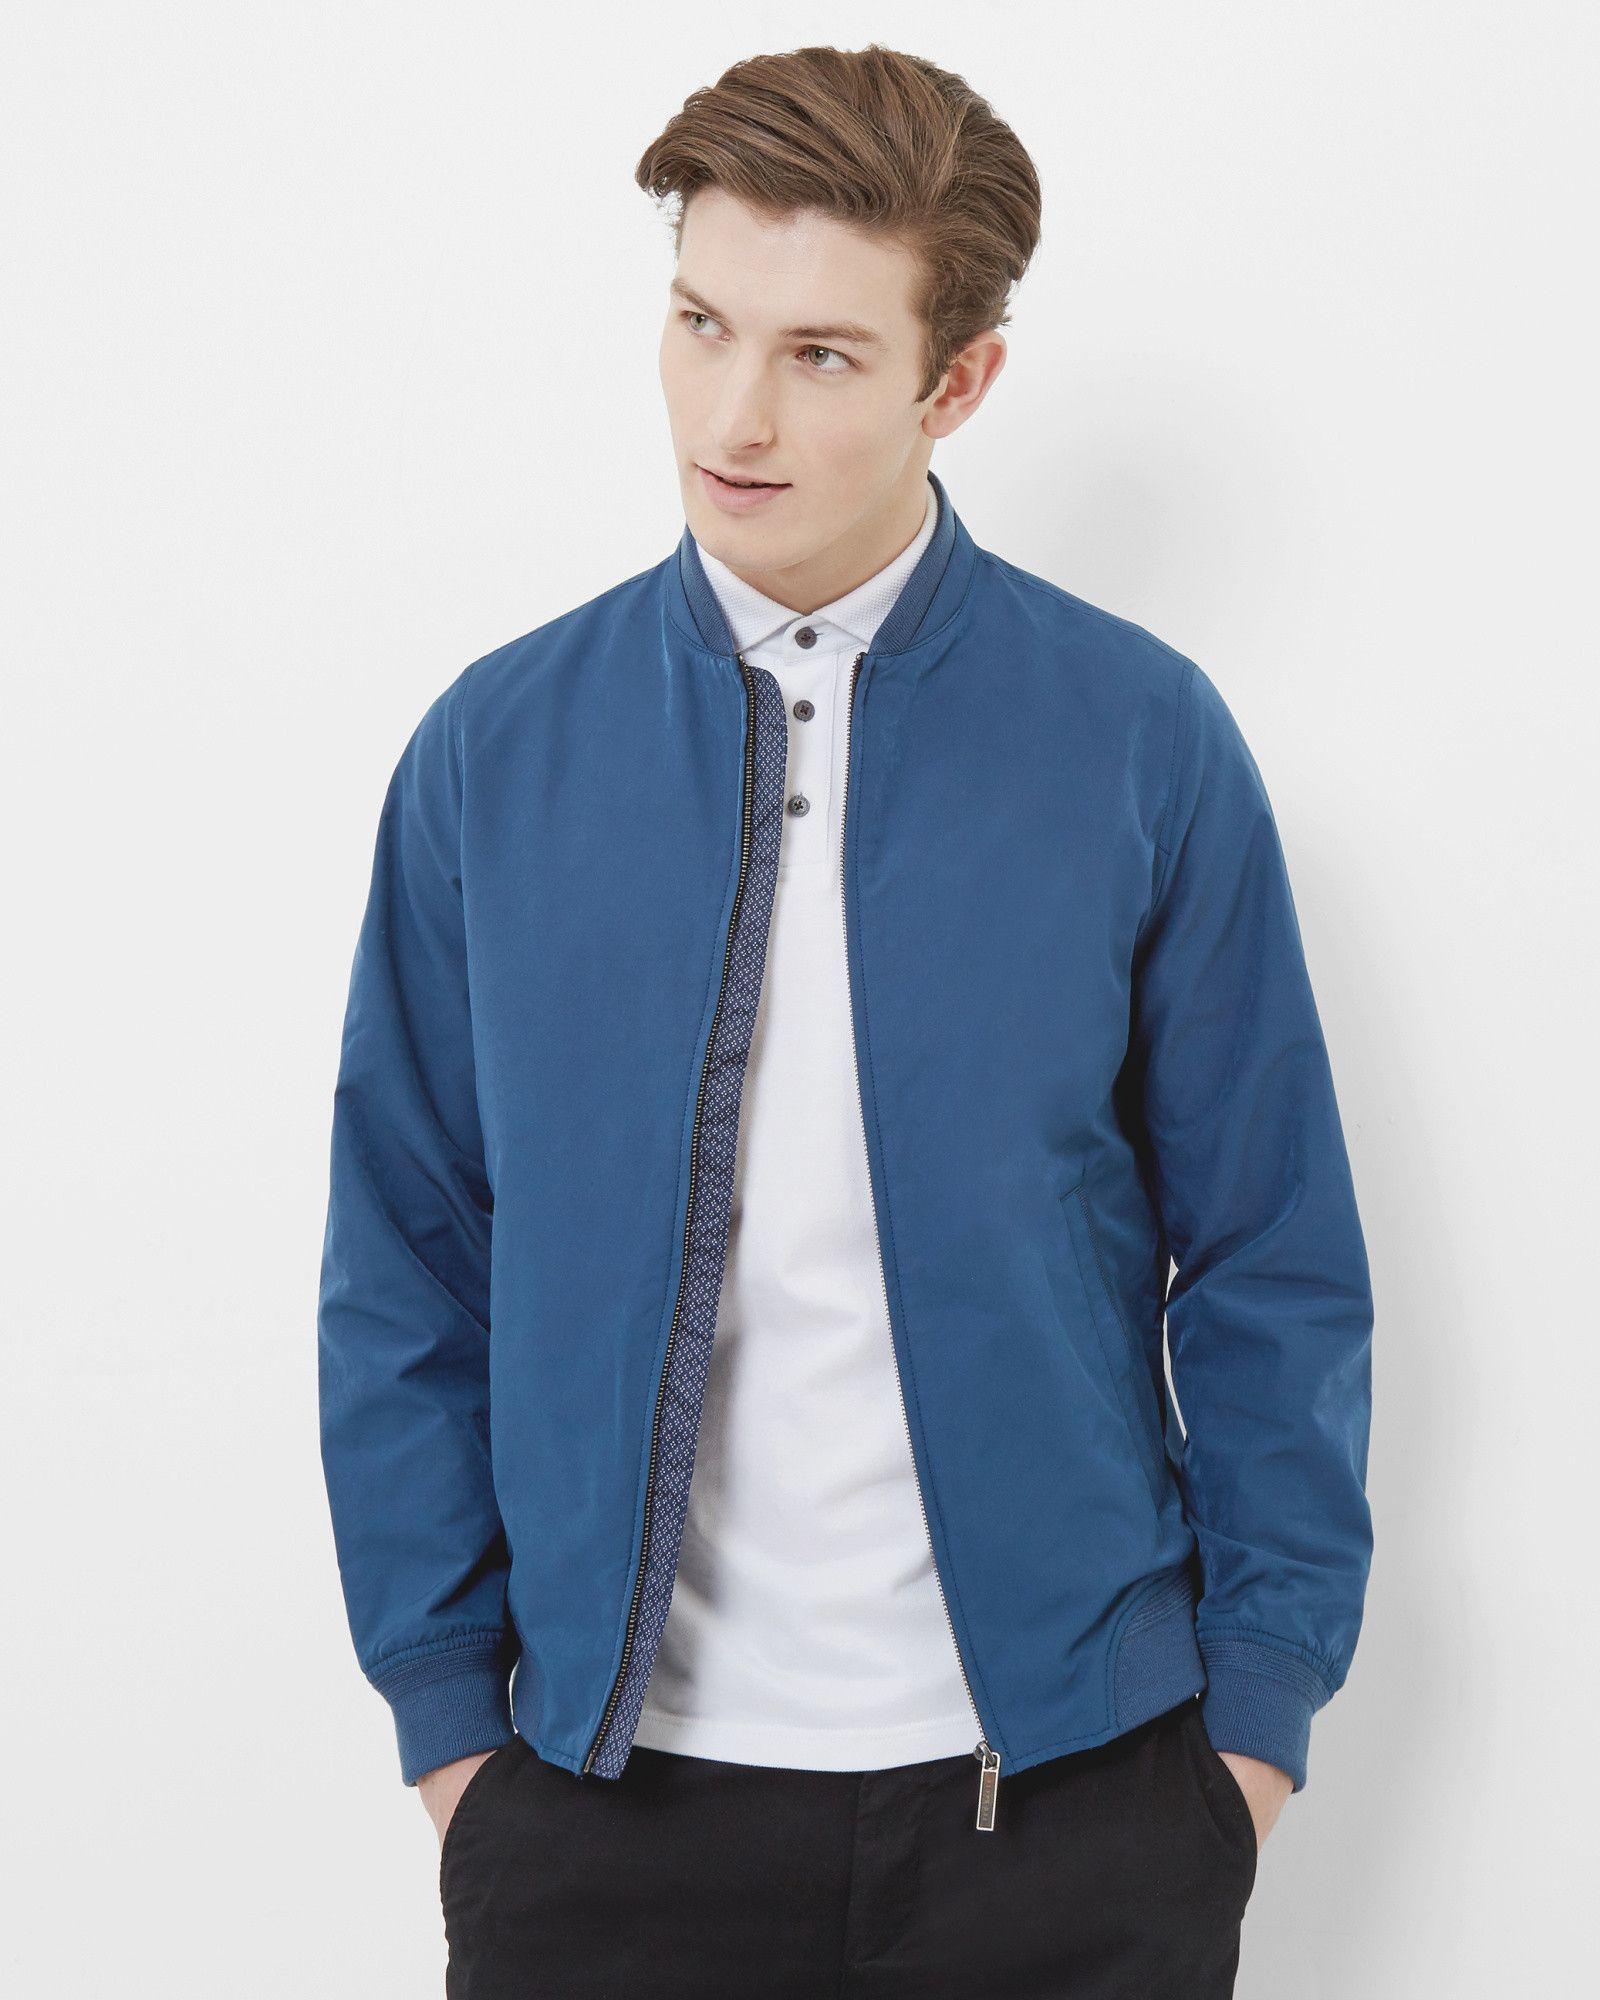 Ted Baker Bomber Jacket Blue Bomber Jacket Jackets Clothes [ 2000 x 1600 Pixel ]